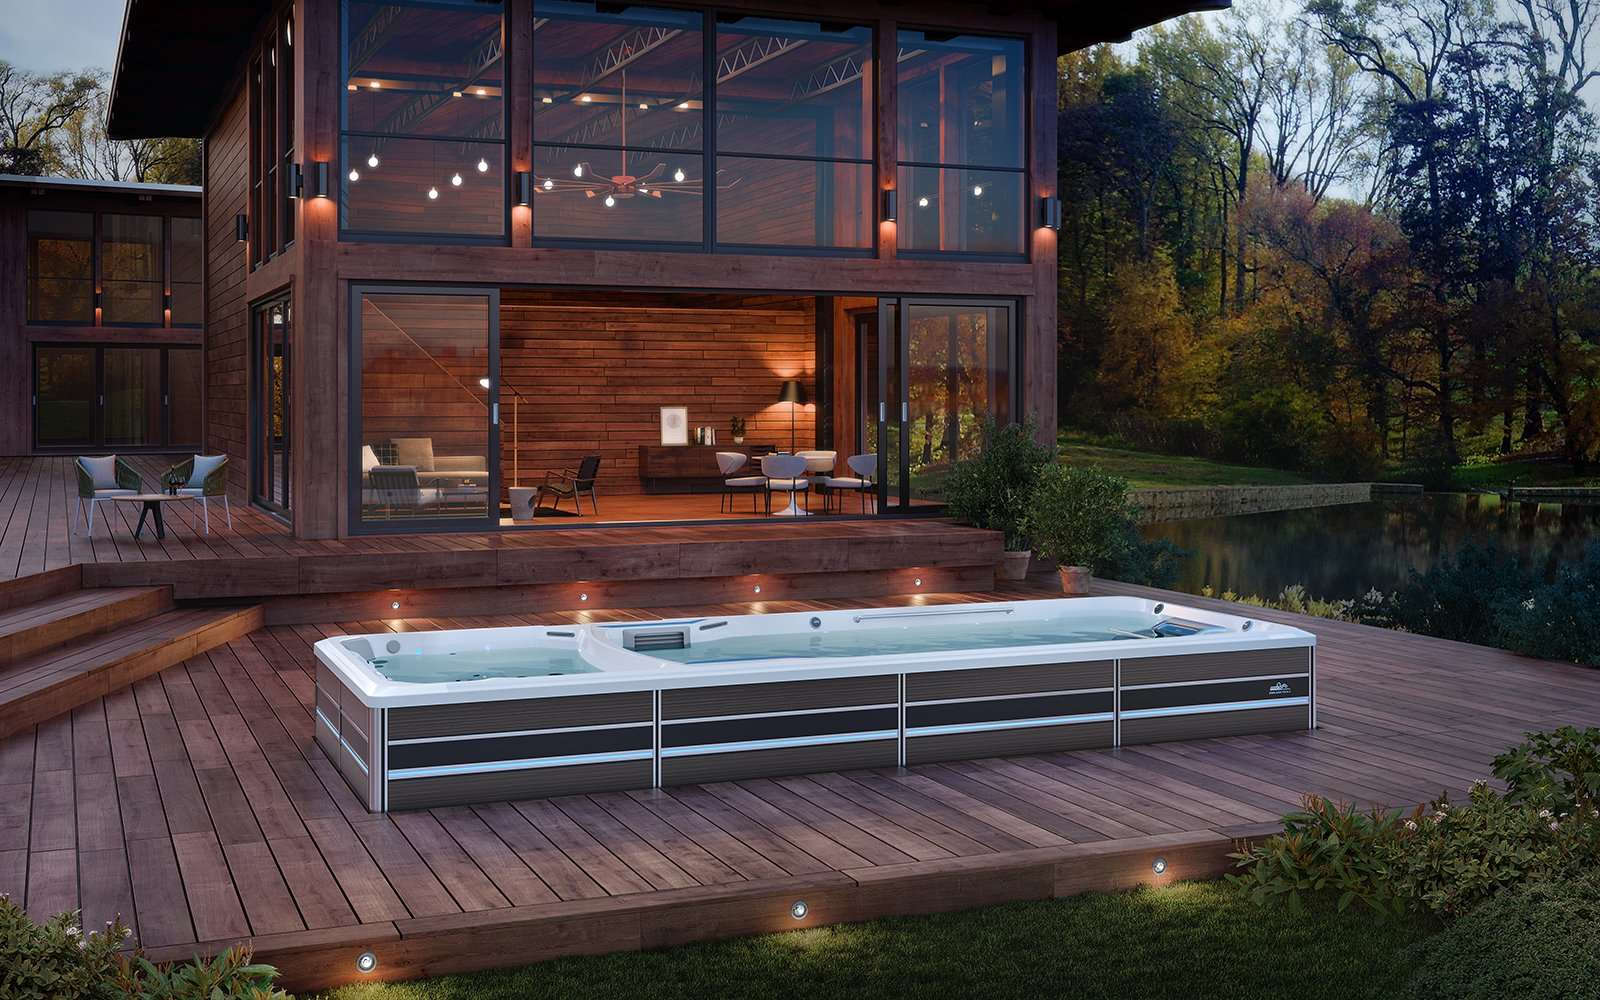 Relax outdoor ∙ update caldera spas utopia the art of living be